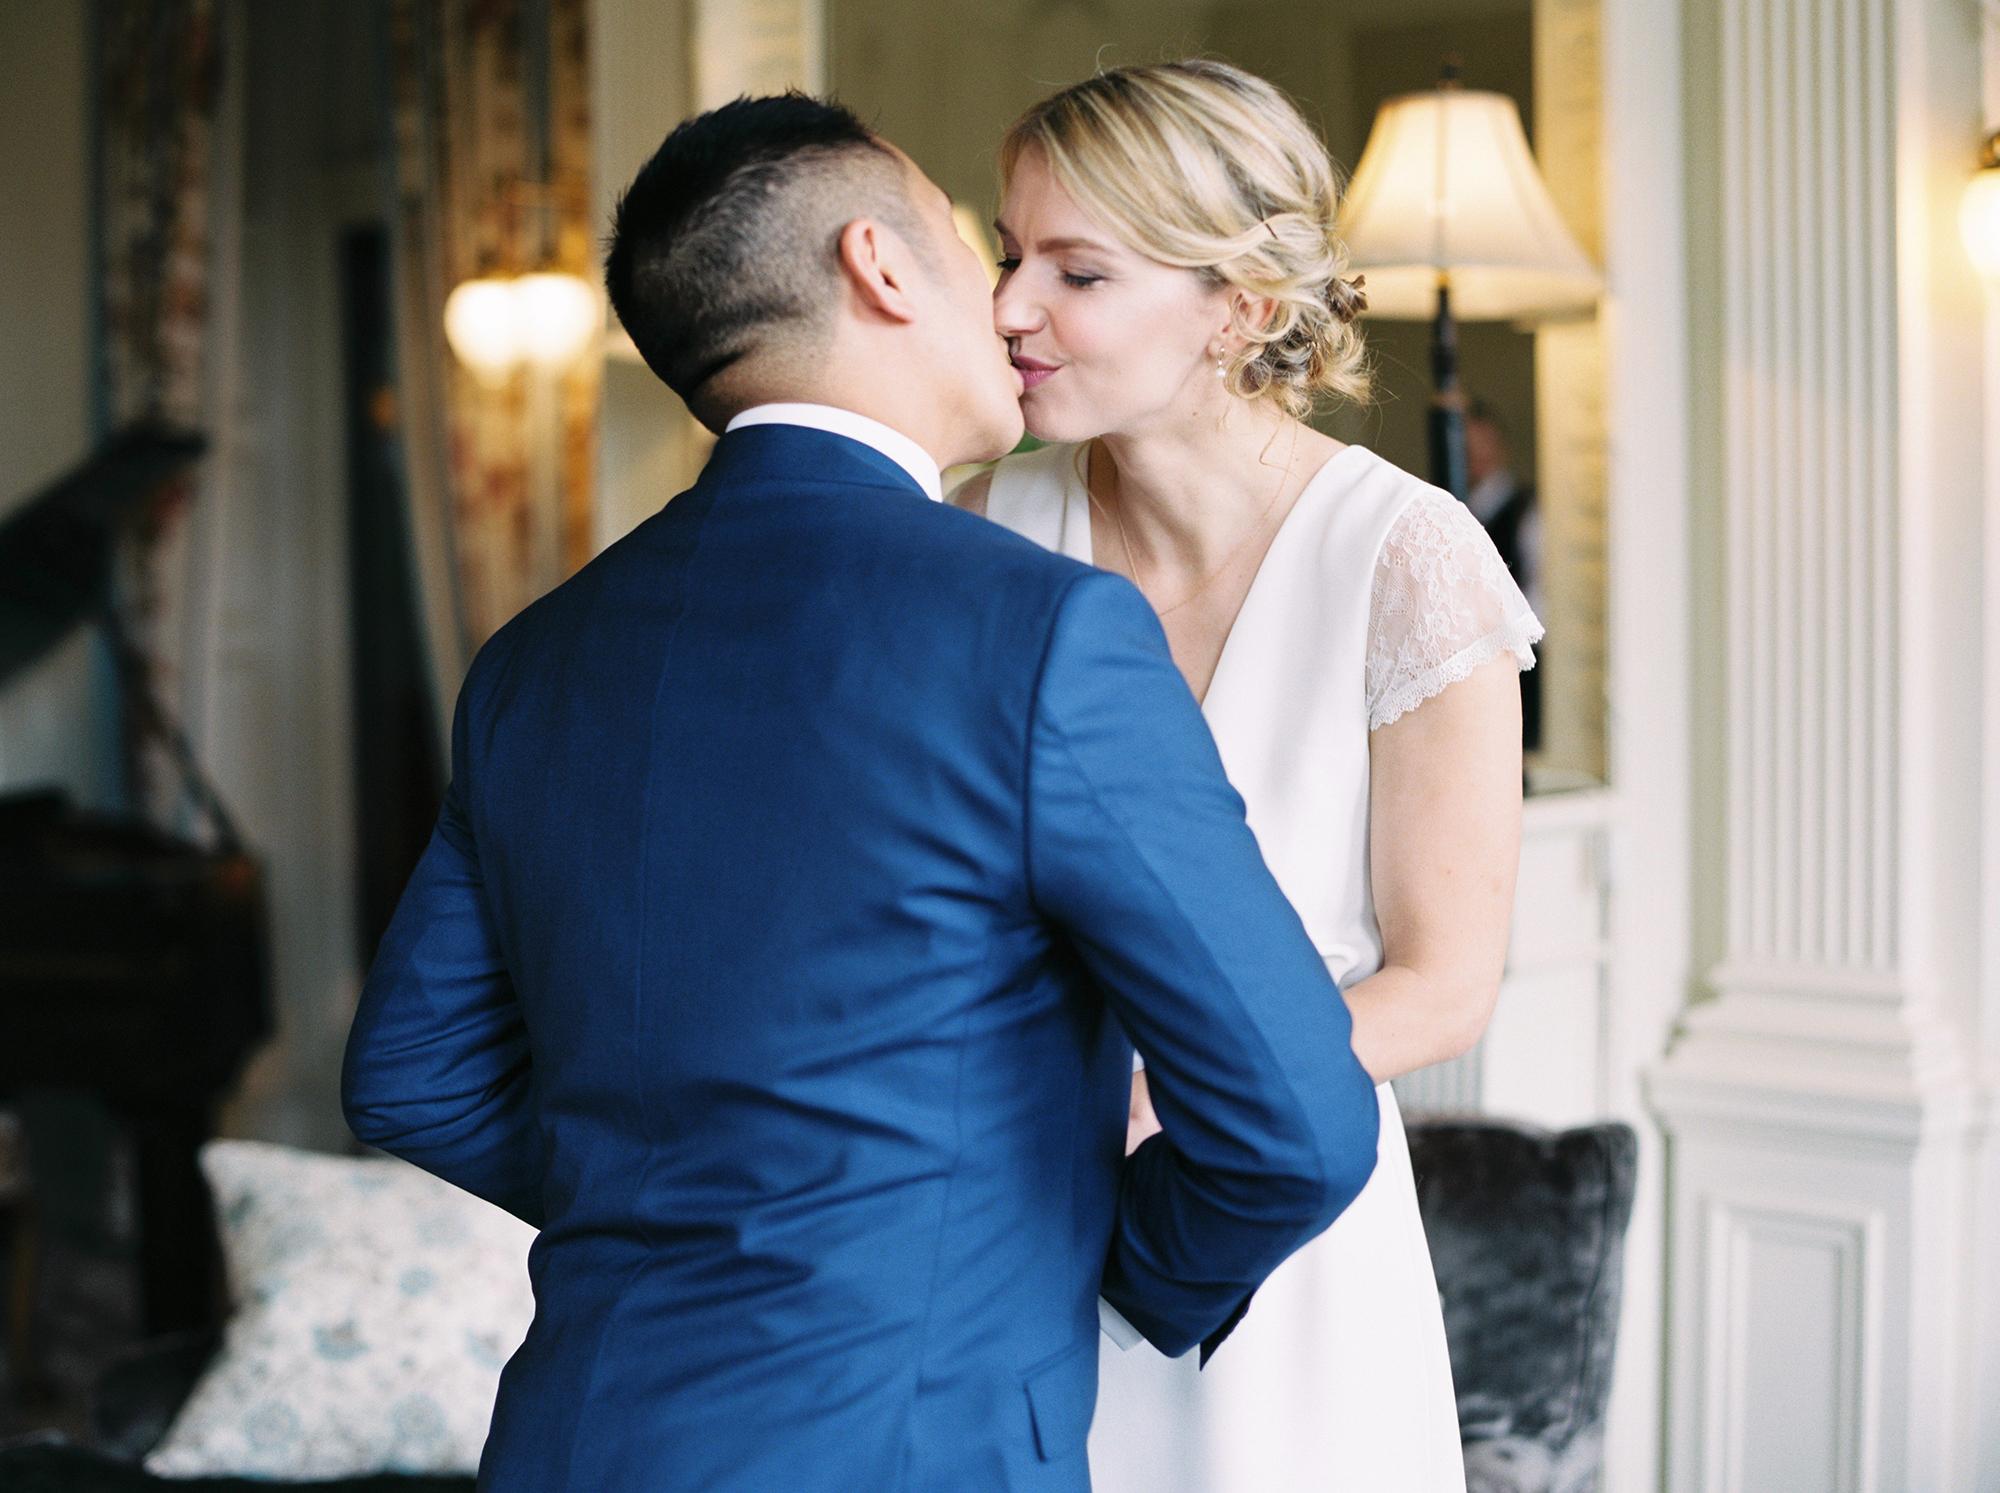 wedding_photographer_cumbria177.jpg